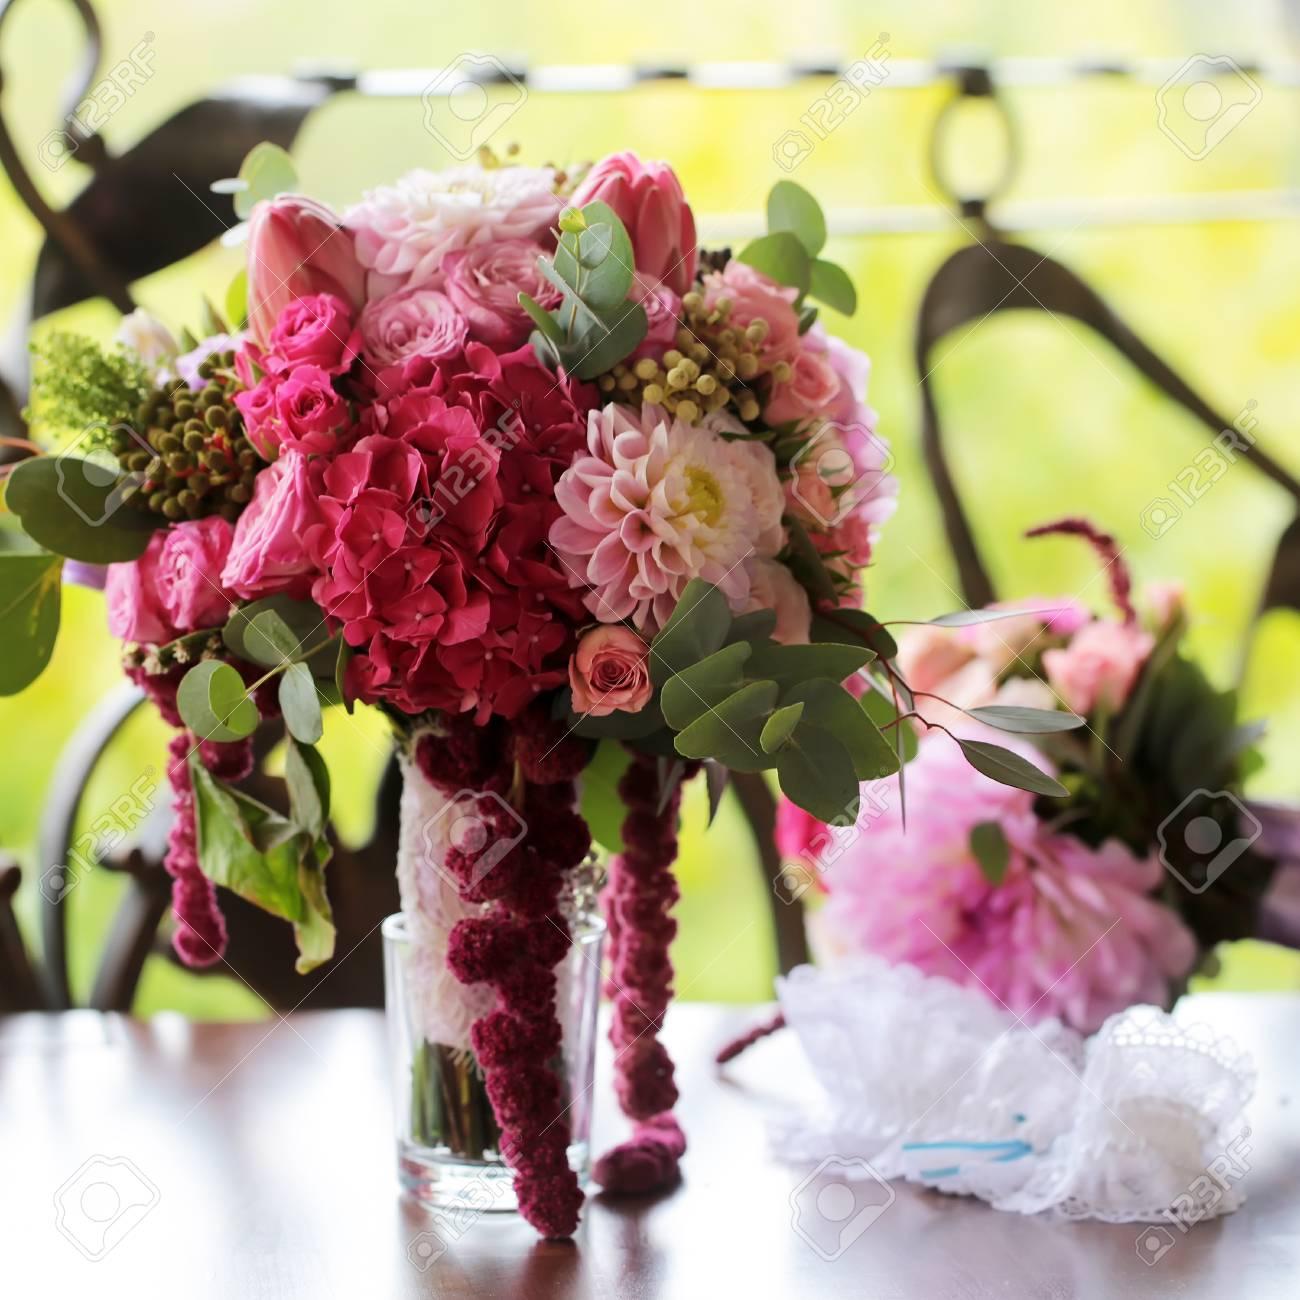 Closeup View Of One Beautiful Fresh Colorful Mixed Wedding Bouquet ...